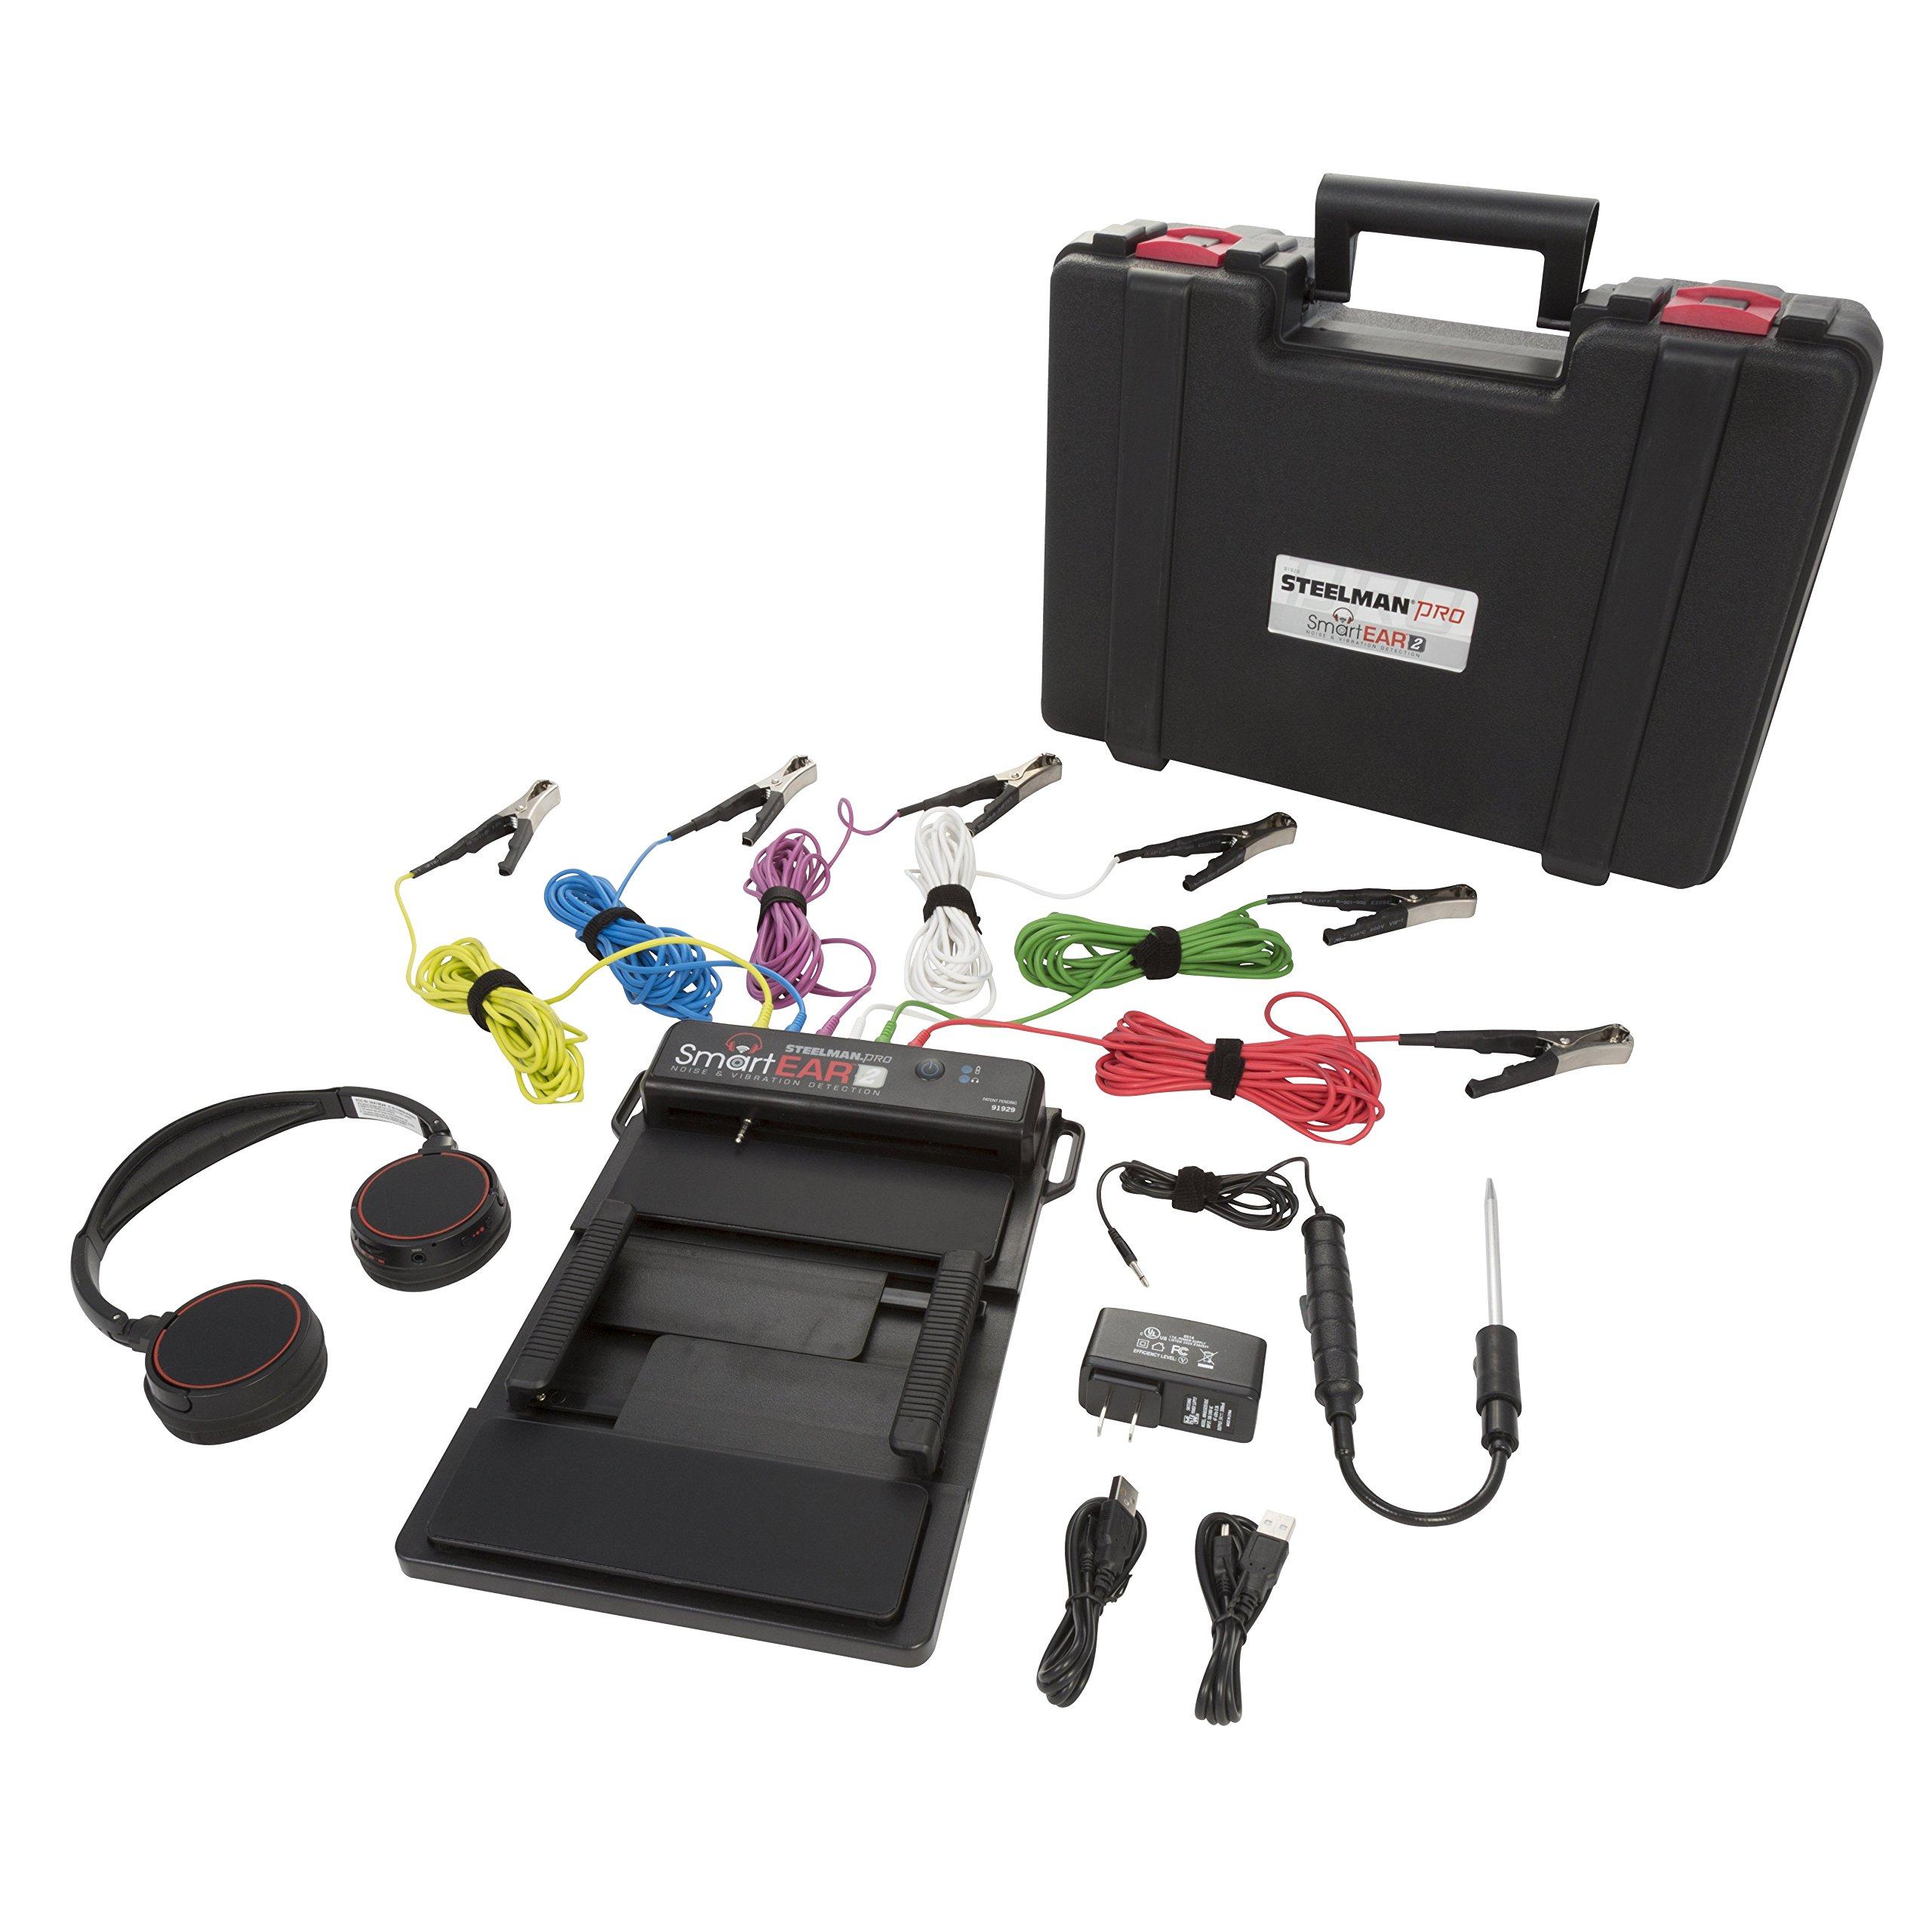 STEELMAN PRO 91929 SmartEAR 2 Sound and Vibration Detection Kit